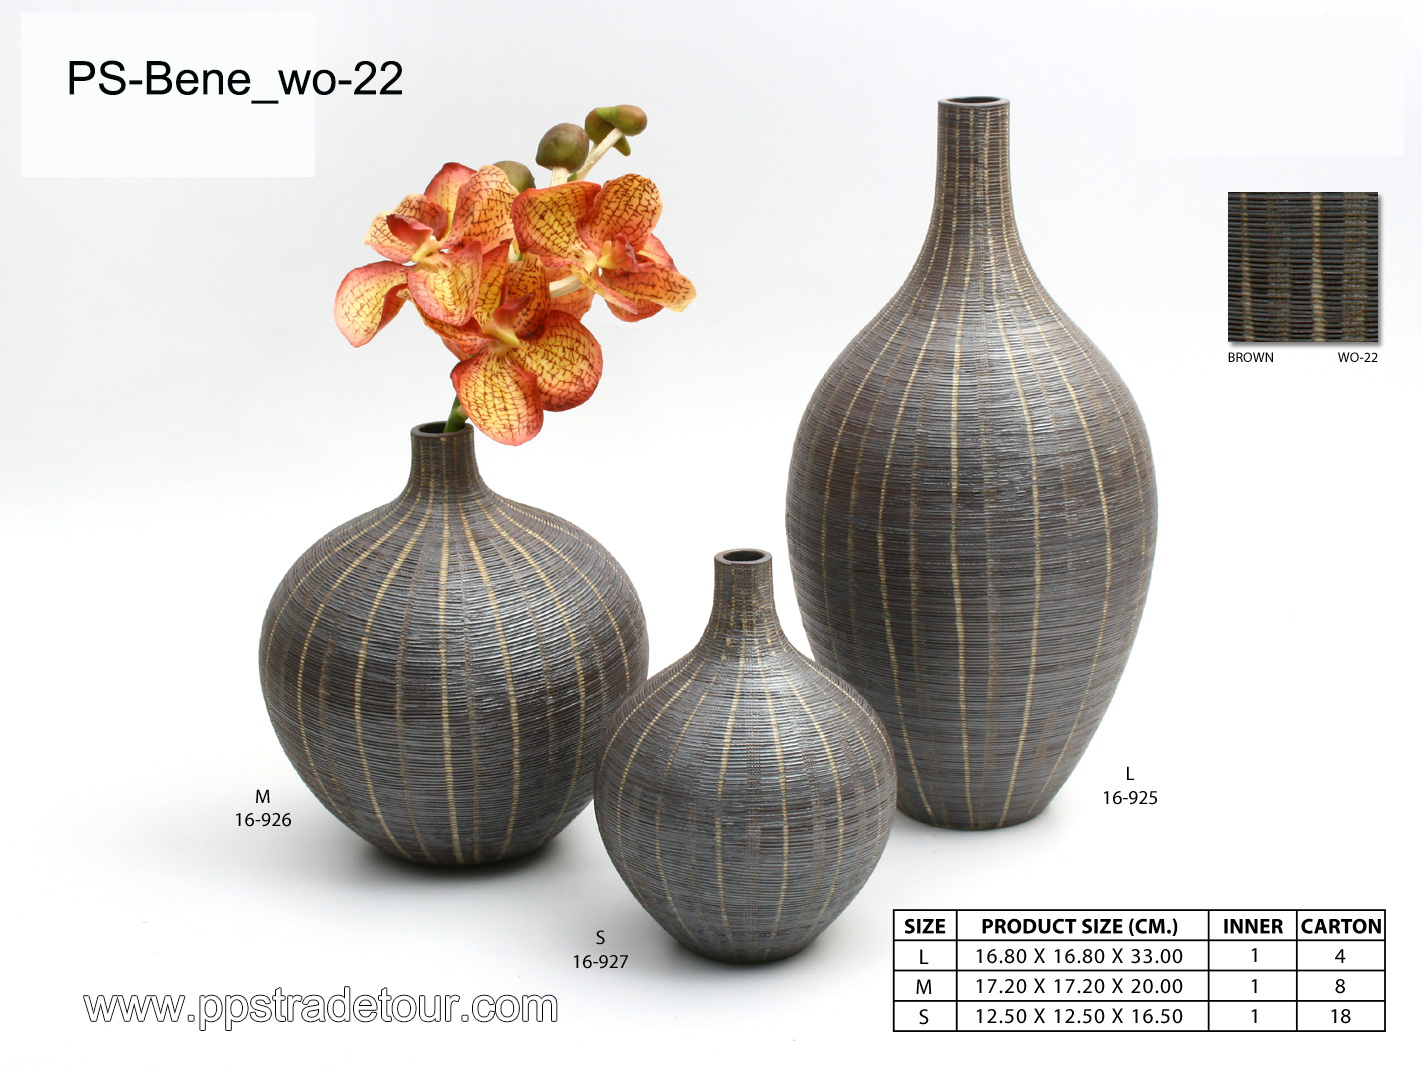 PSCV-Bene_wo-22